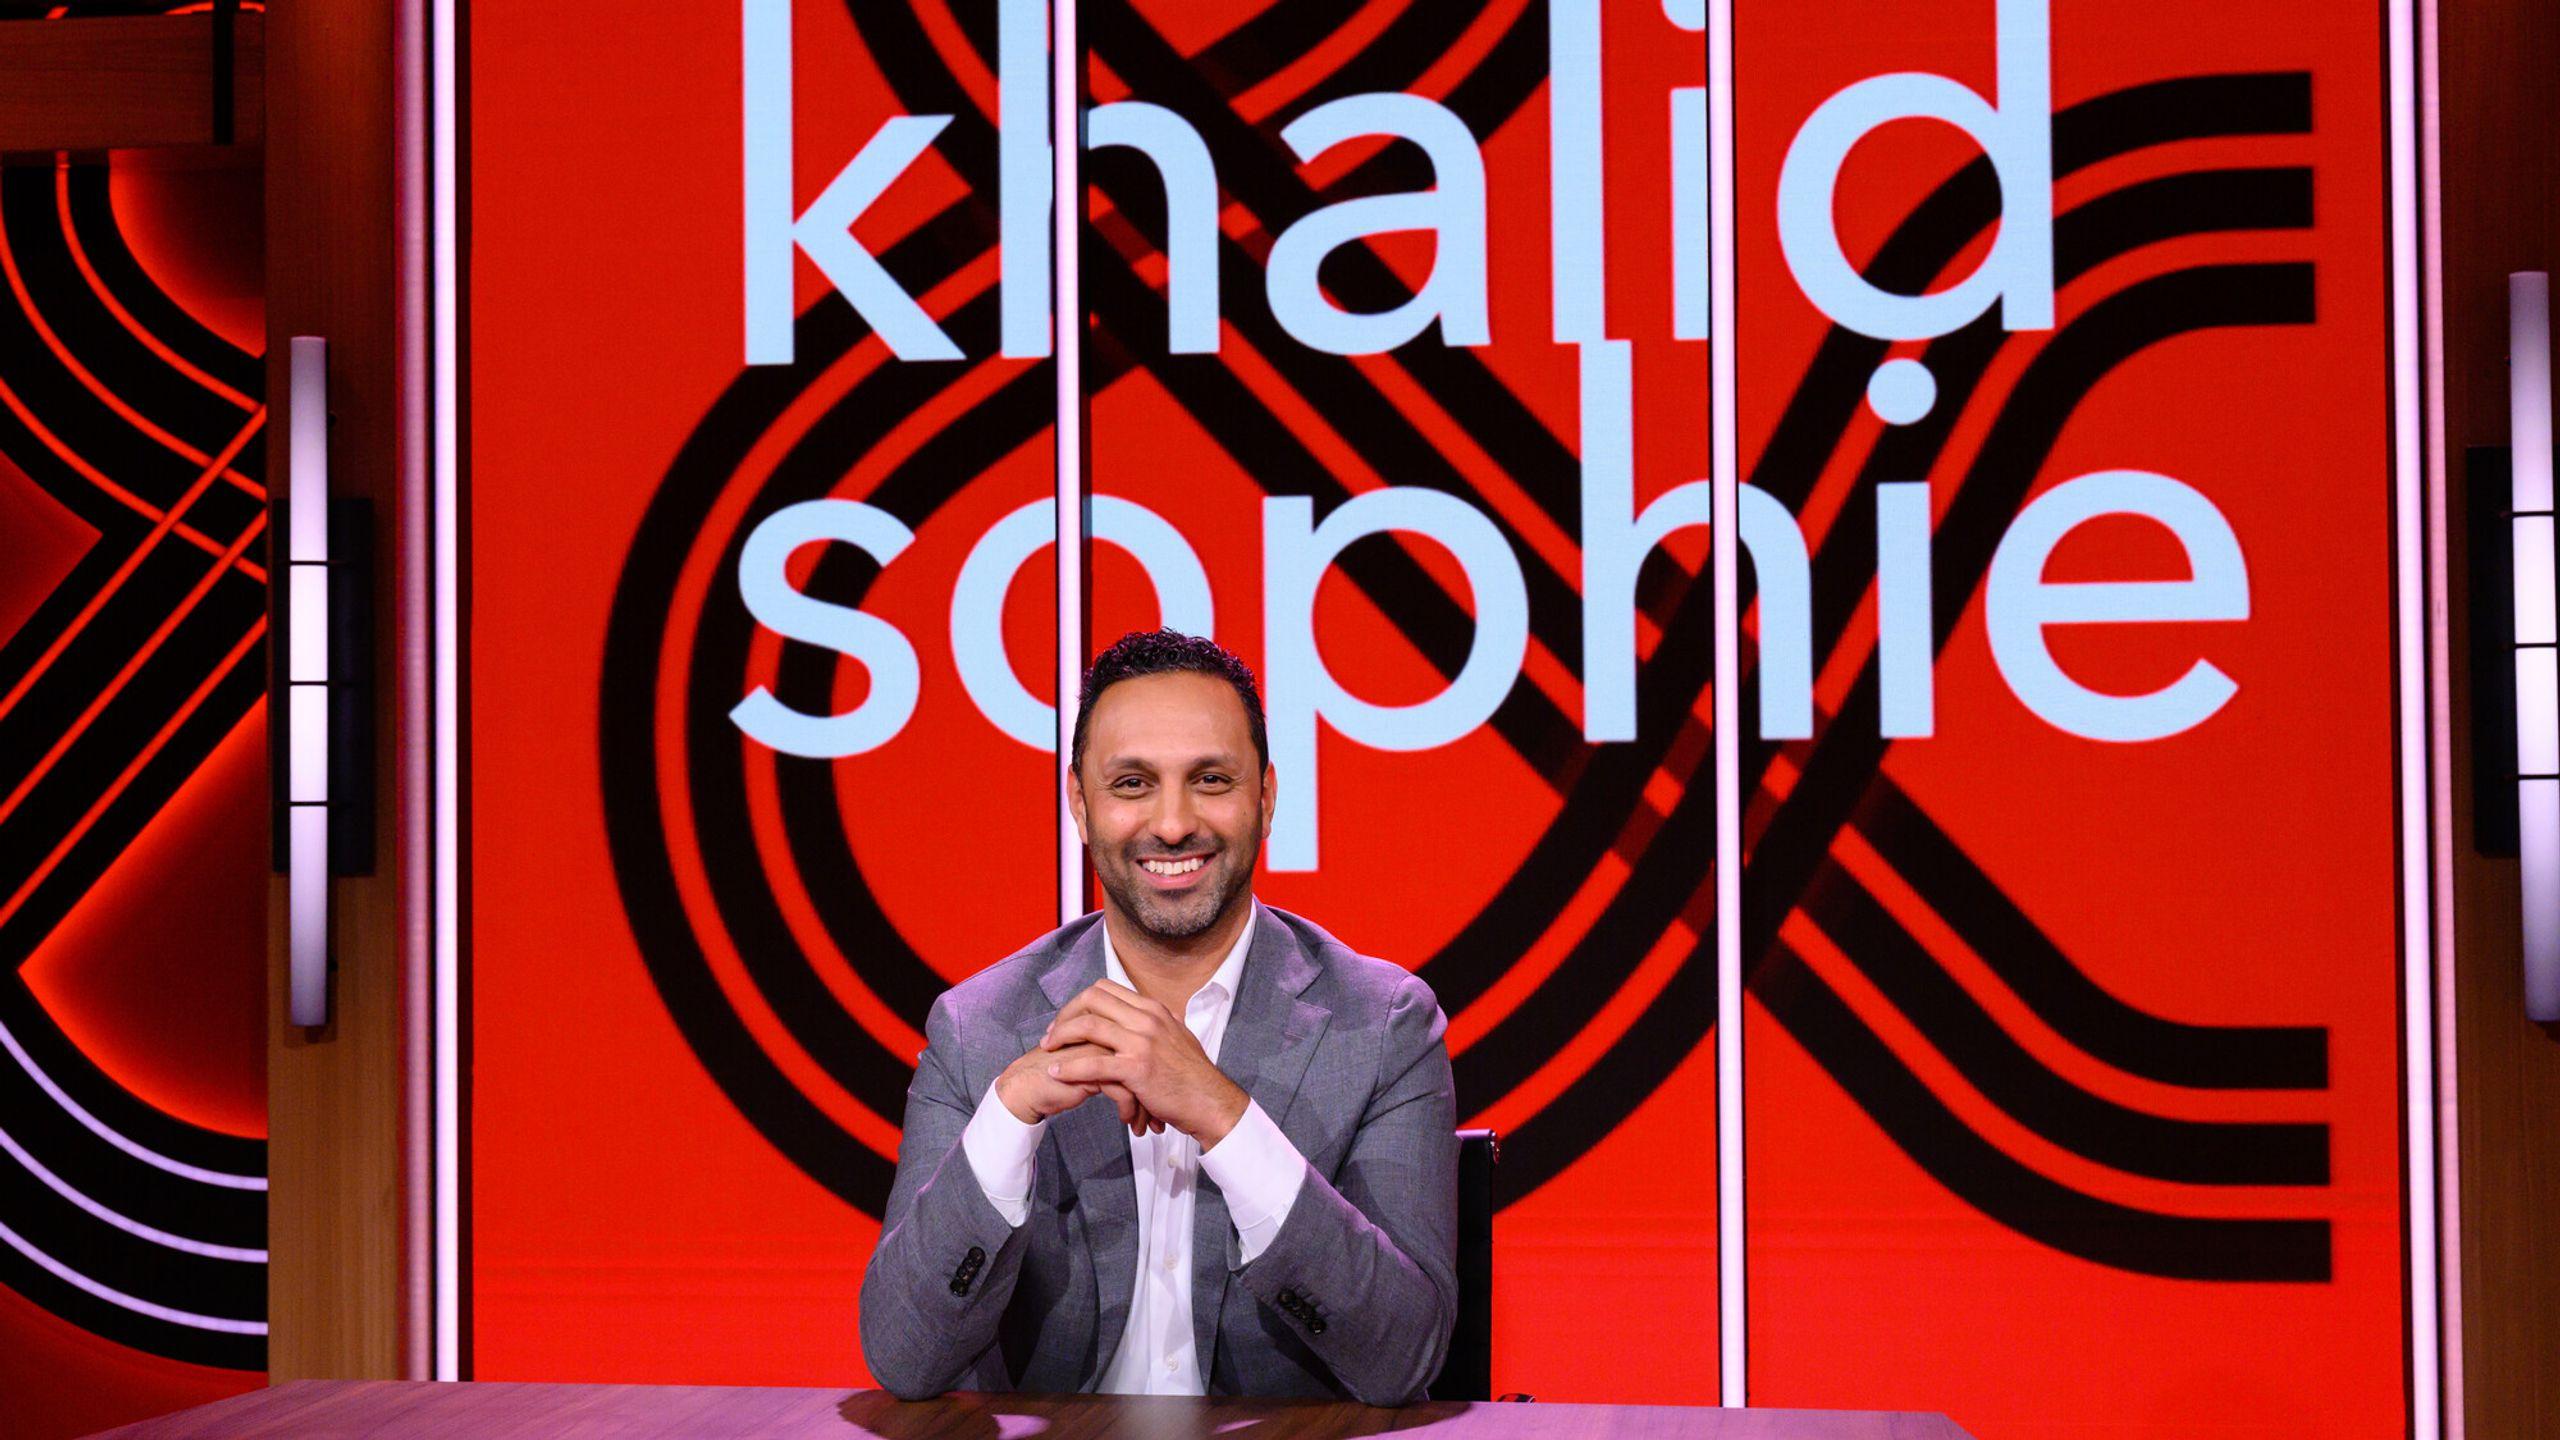 Khalid & Sophie